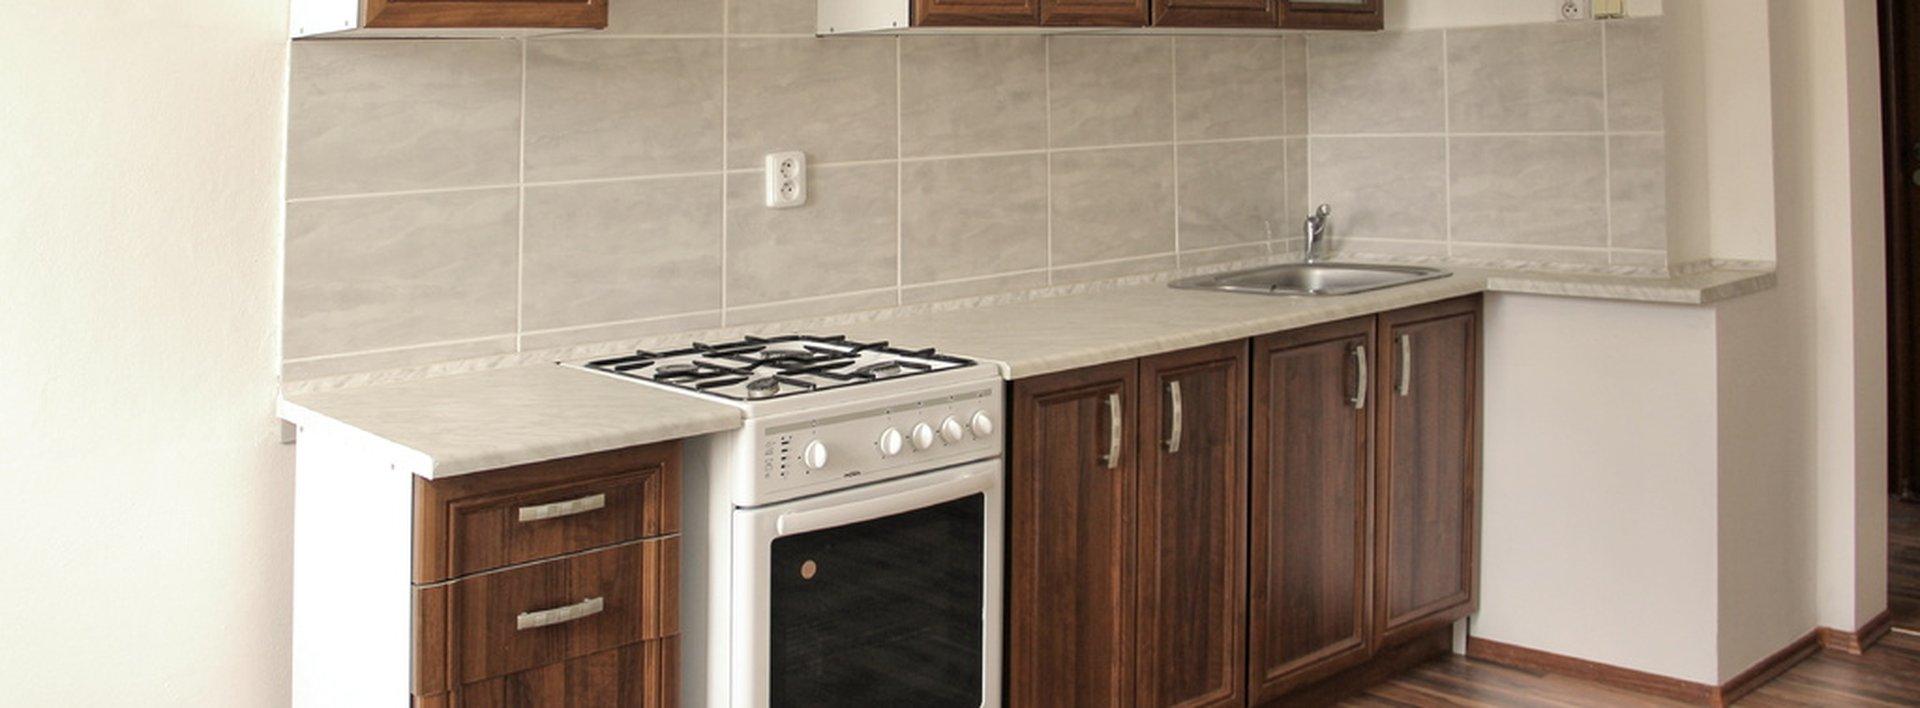 Prodej bytu 2+1 po rekonstrukci, 70m², Ev.č.: N47369